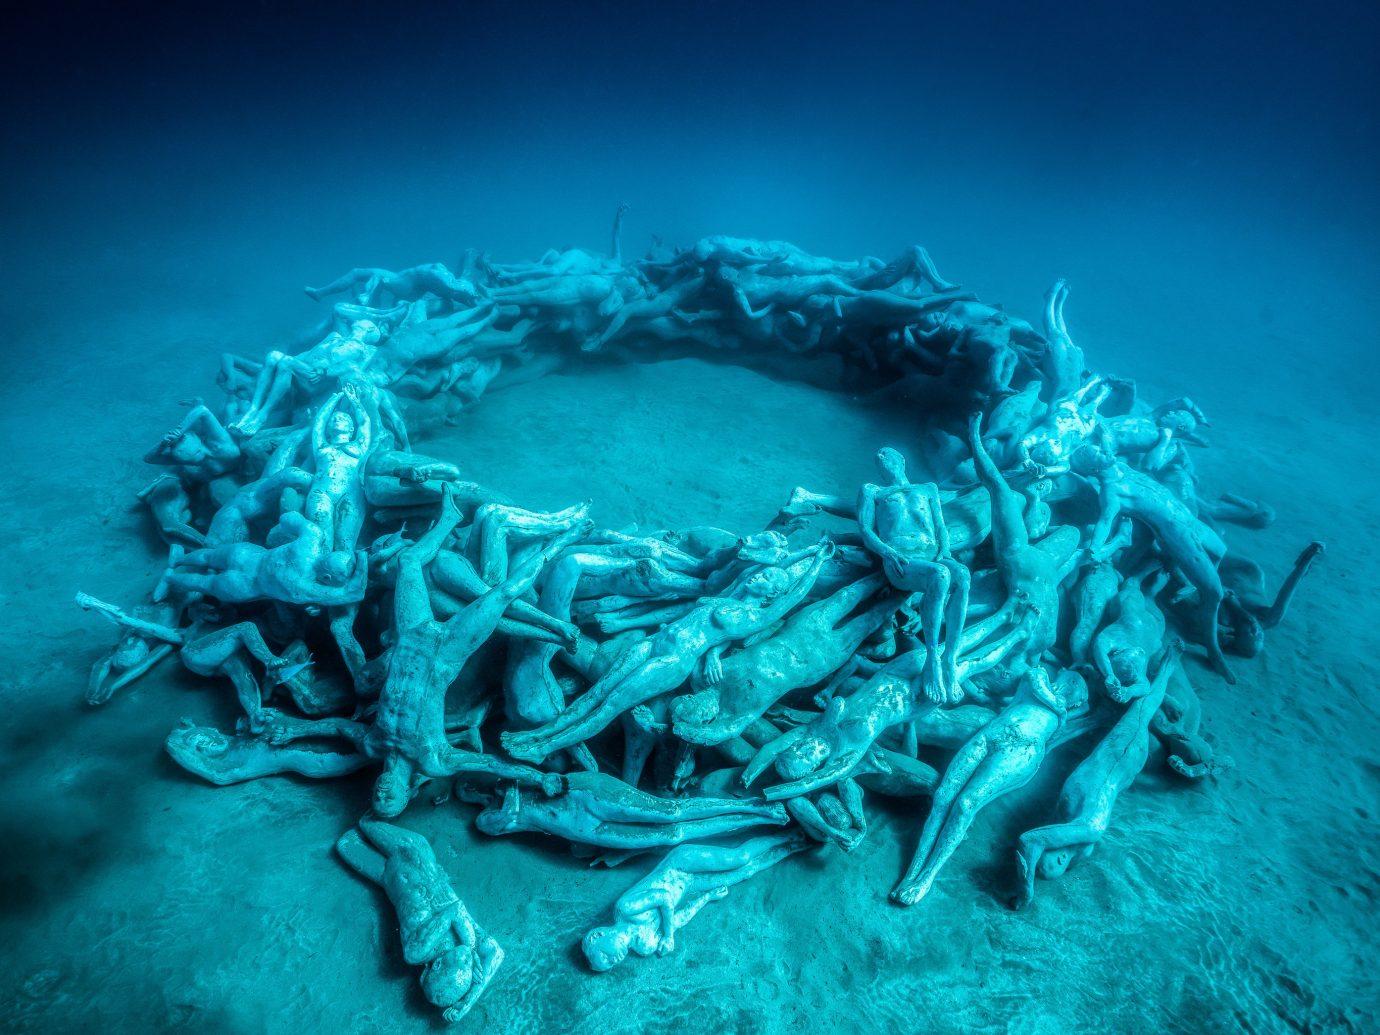 Arts + Culture Offbeat Scuba Diving + Snorkeling Trip Ideas arthropod animal invertebrate crab blue marine biology underwater biology reef Ocean Sea deep sea fish coral reef lobster